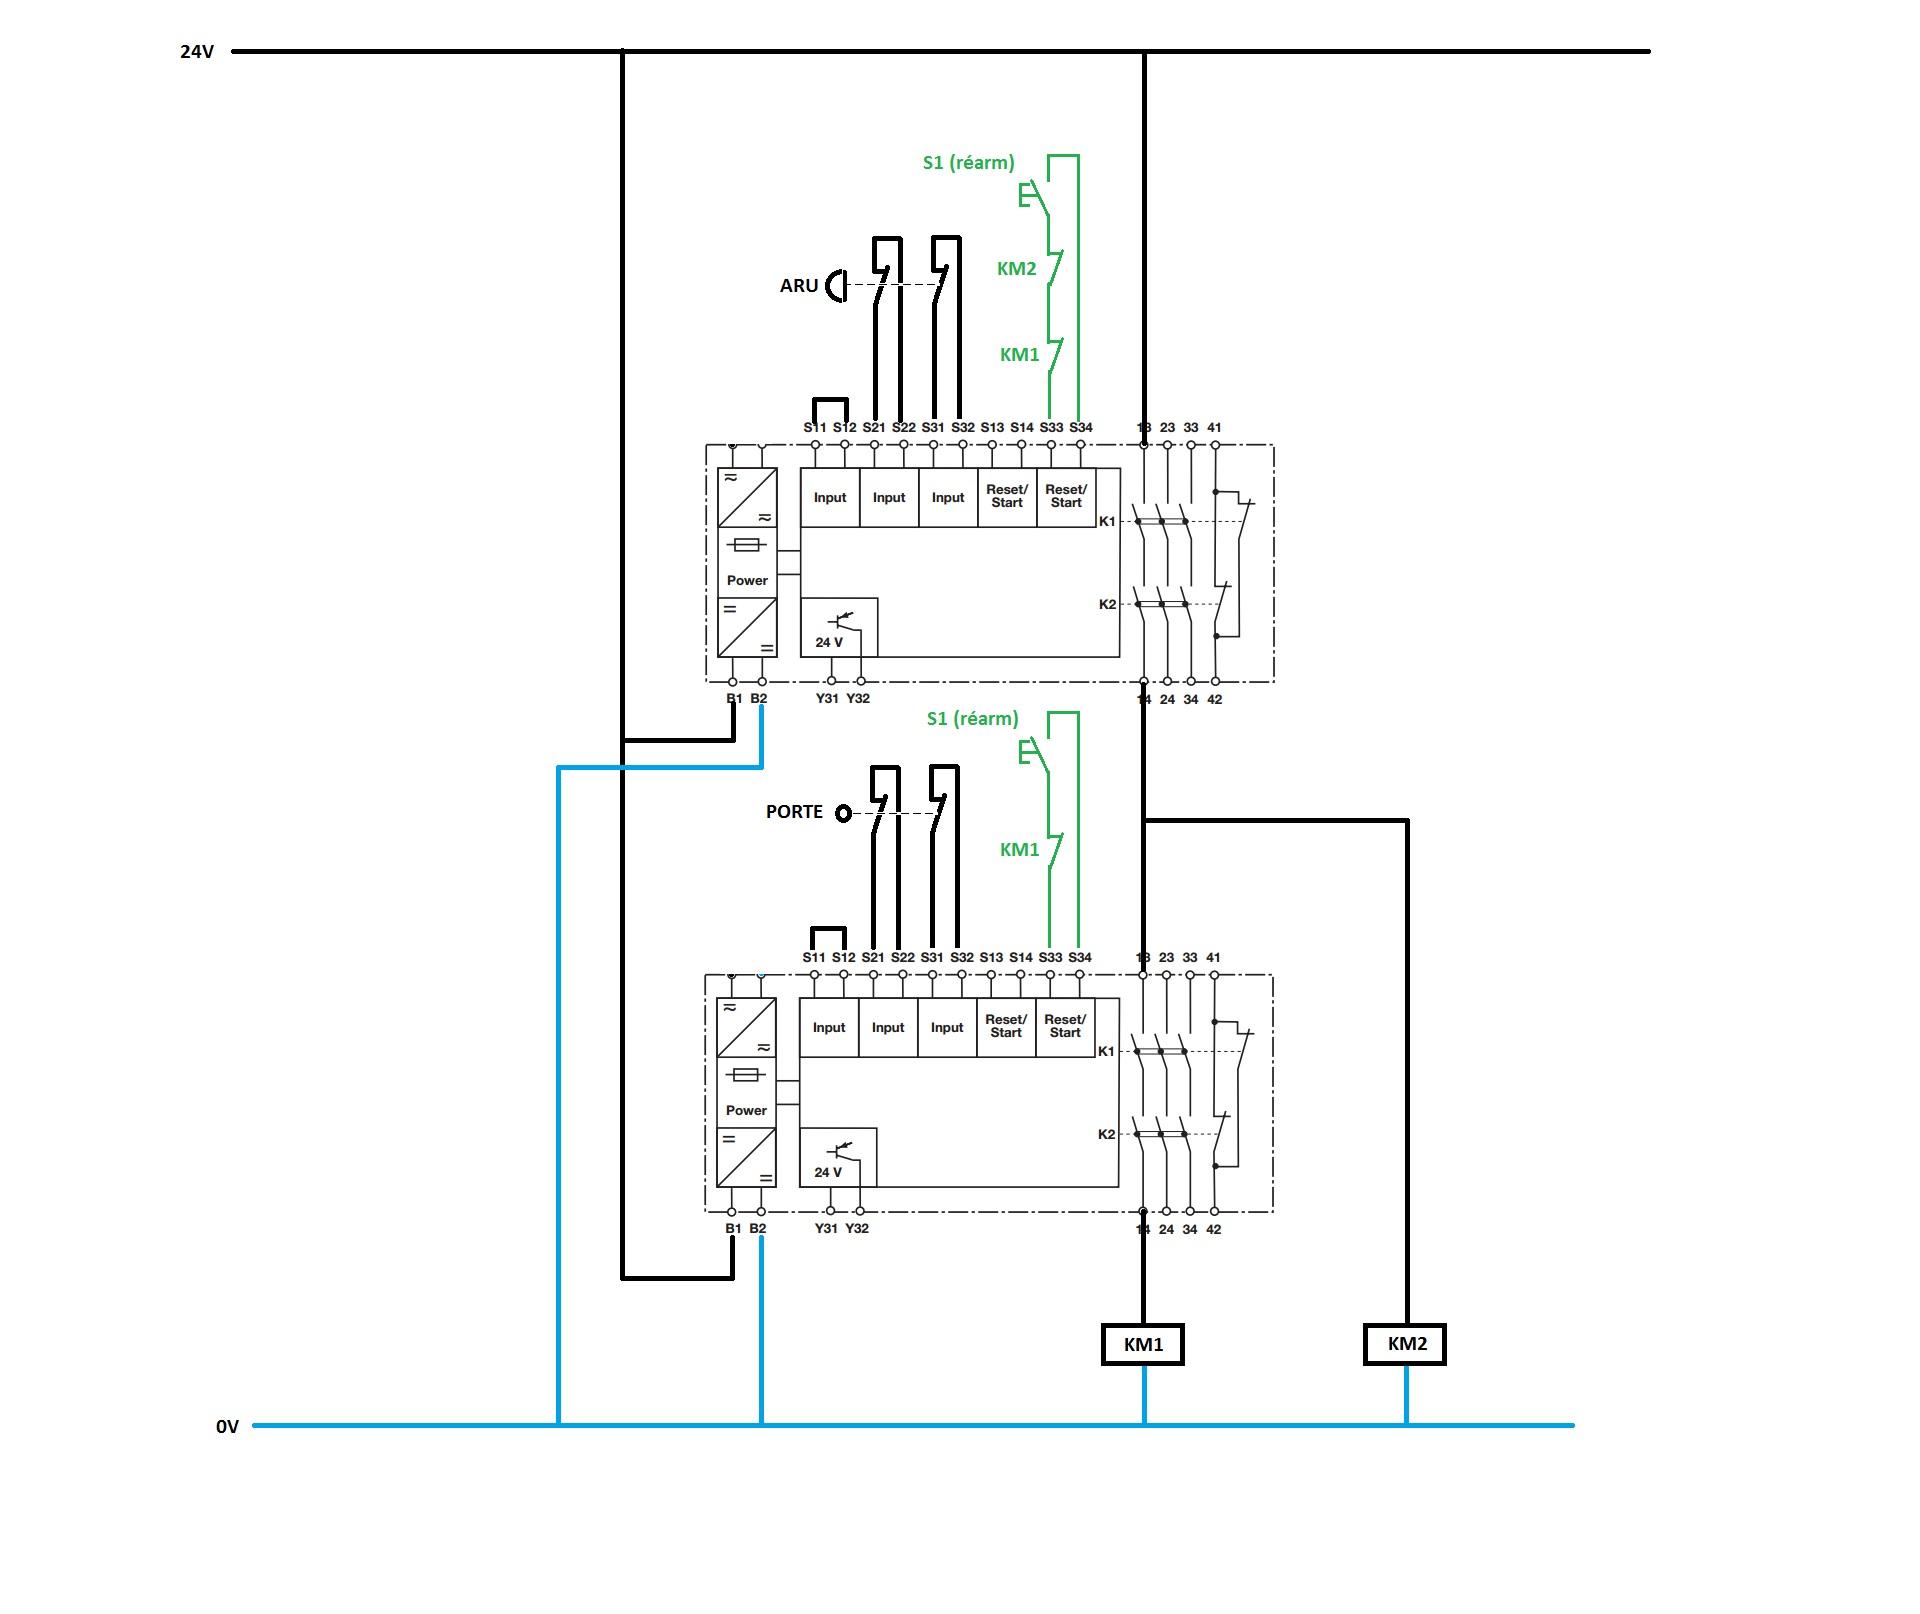 Pilz Relay Wiring